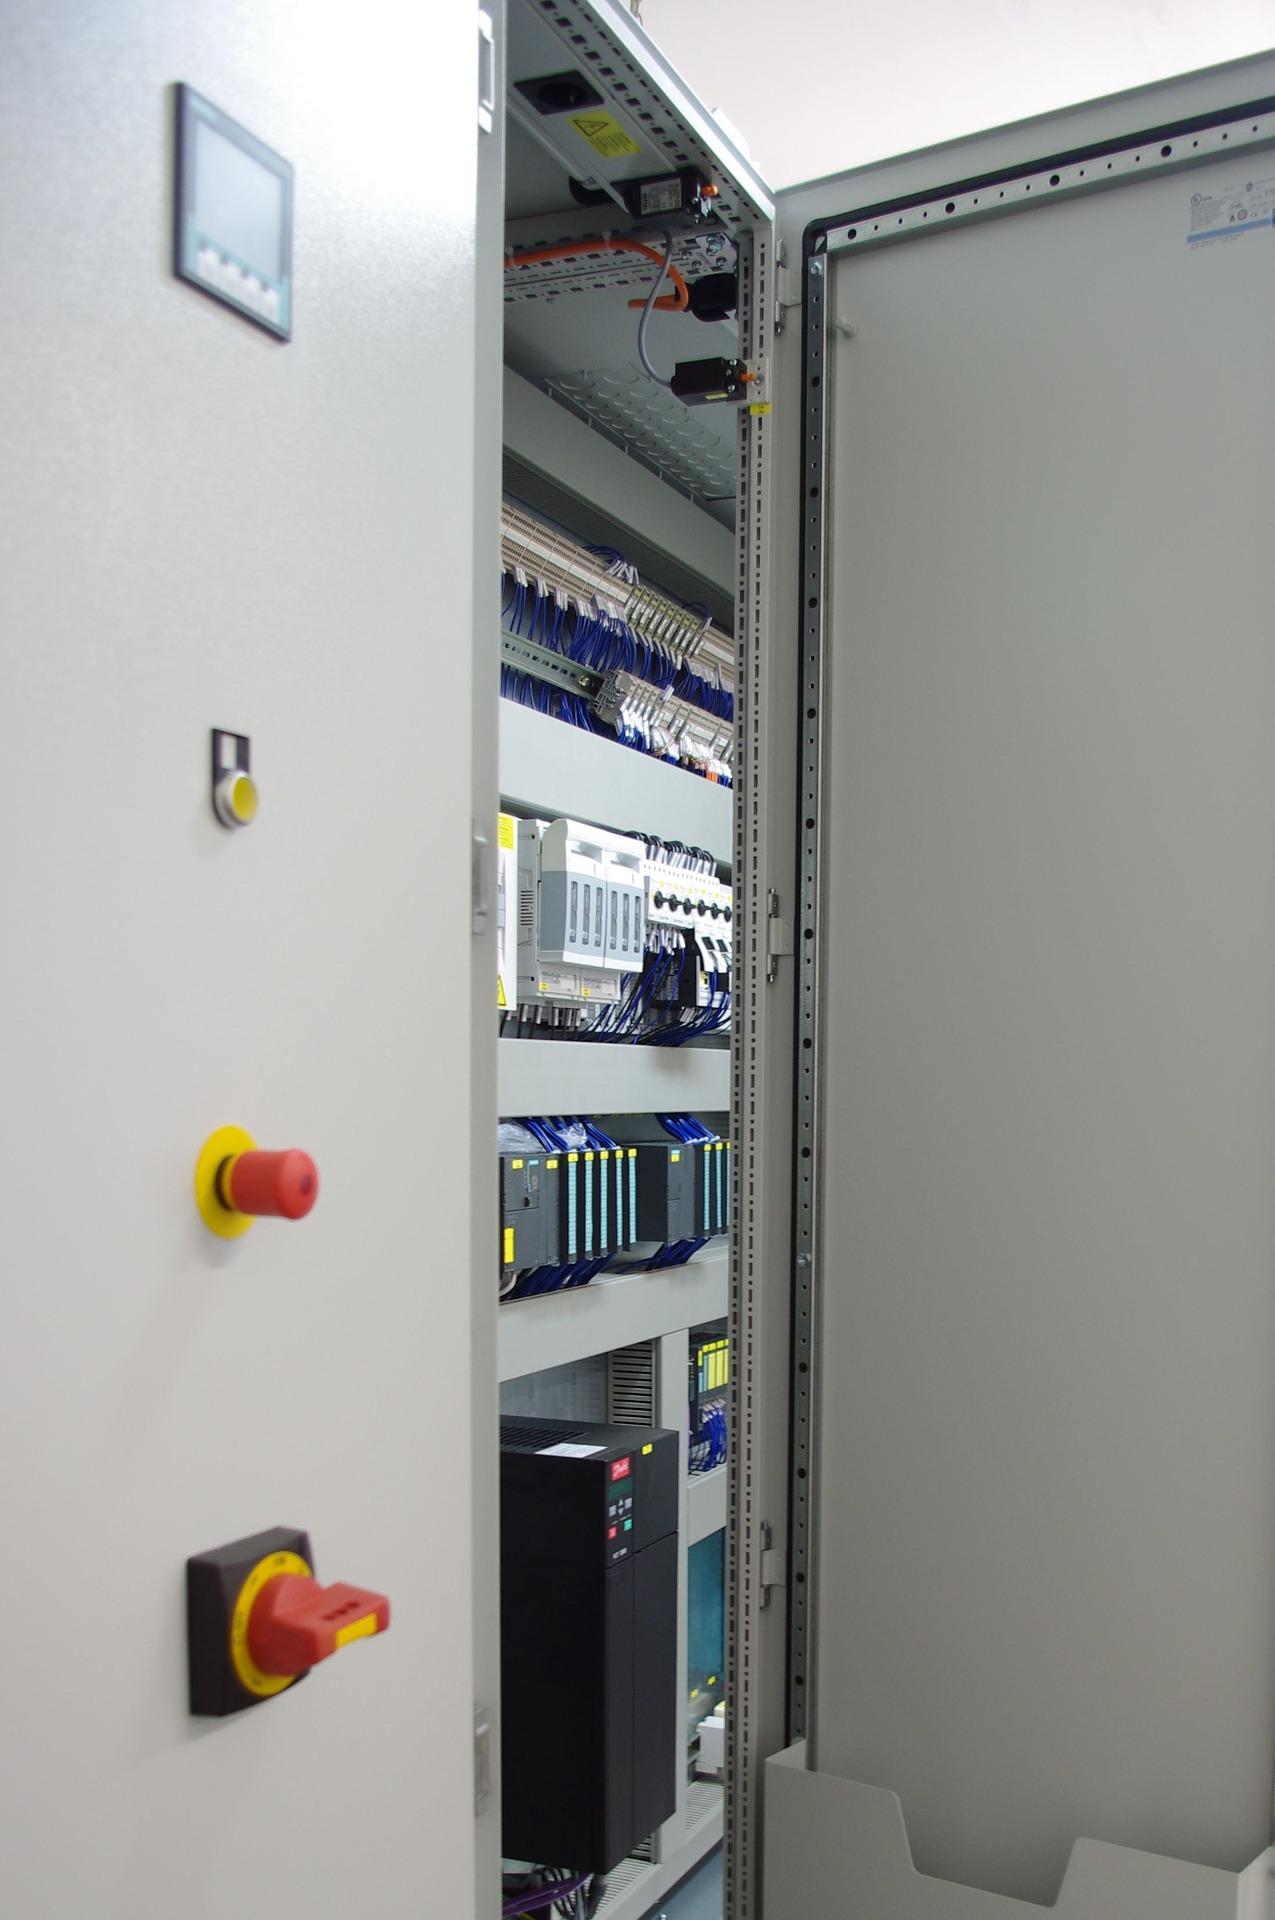 control-cabinet-778666_1920.jpg